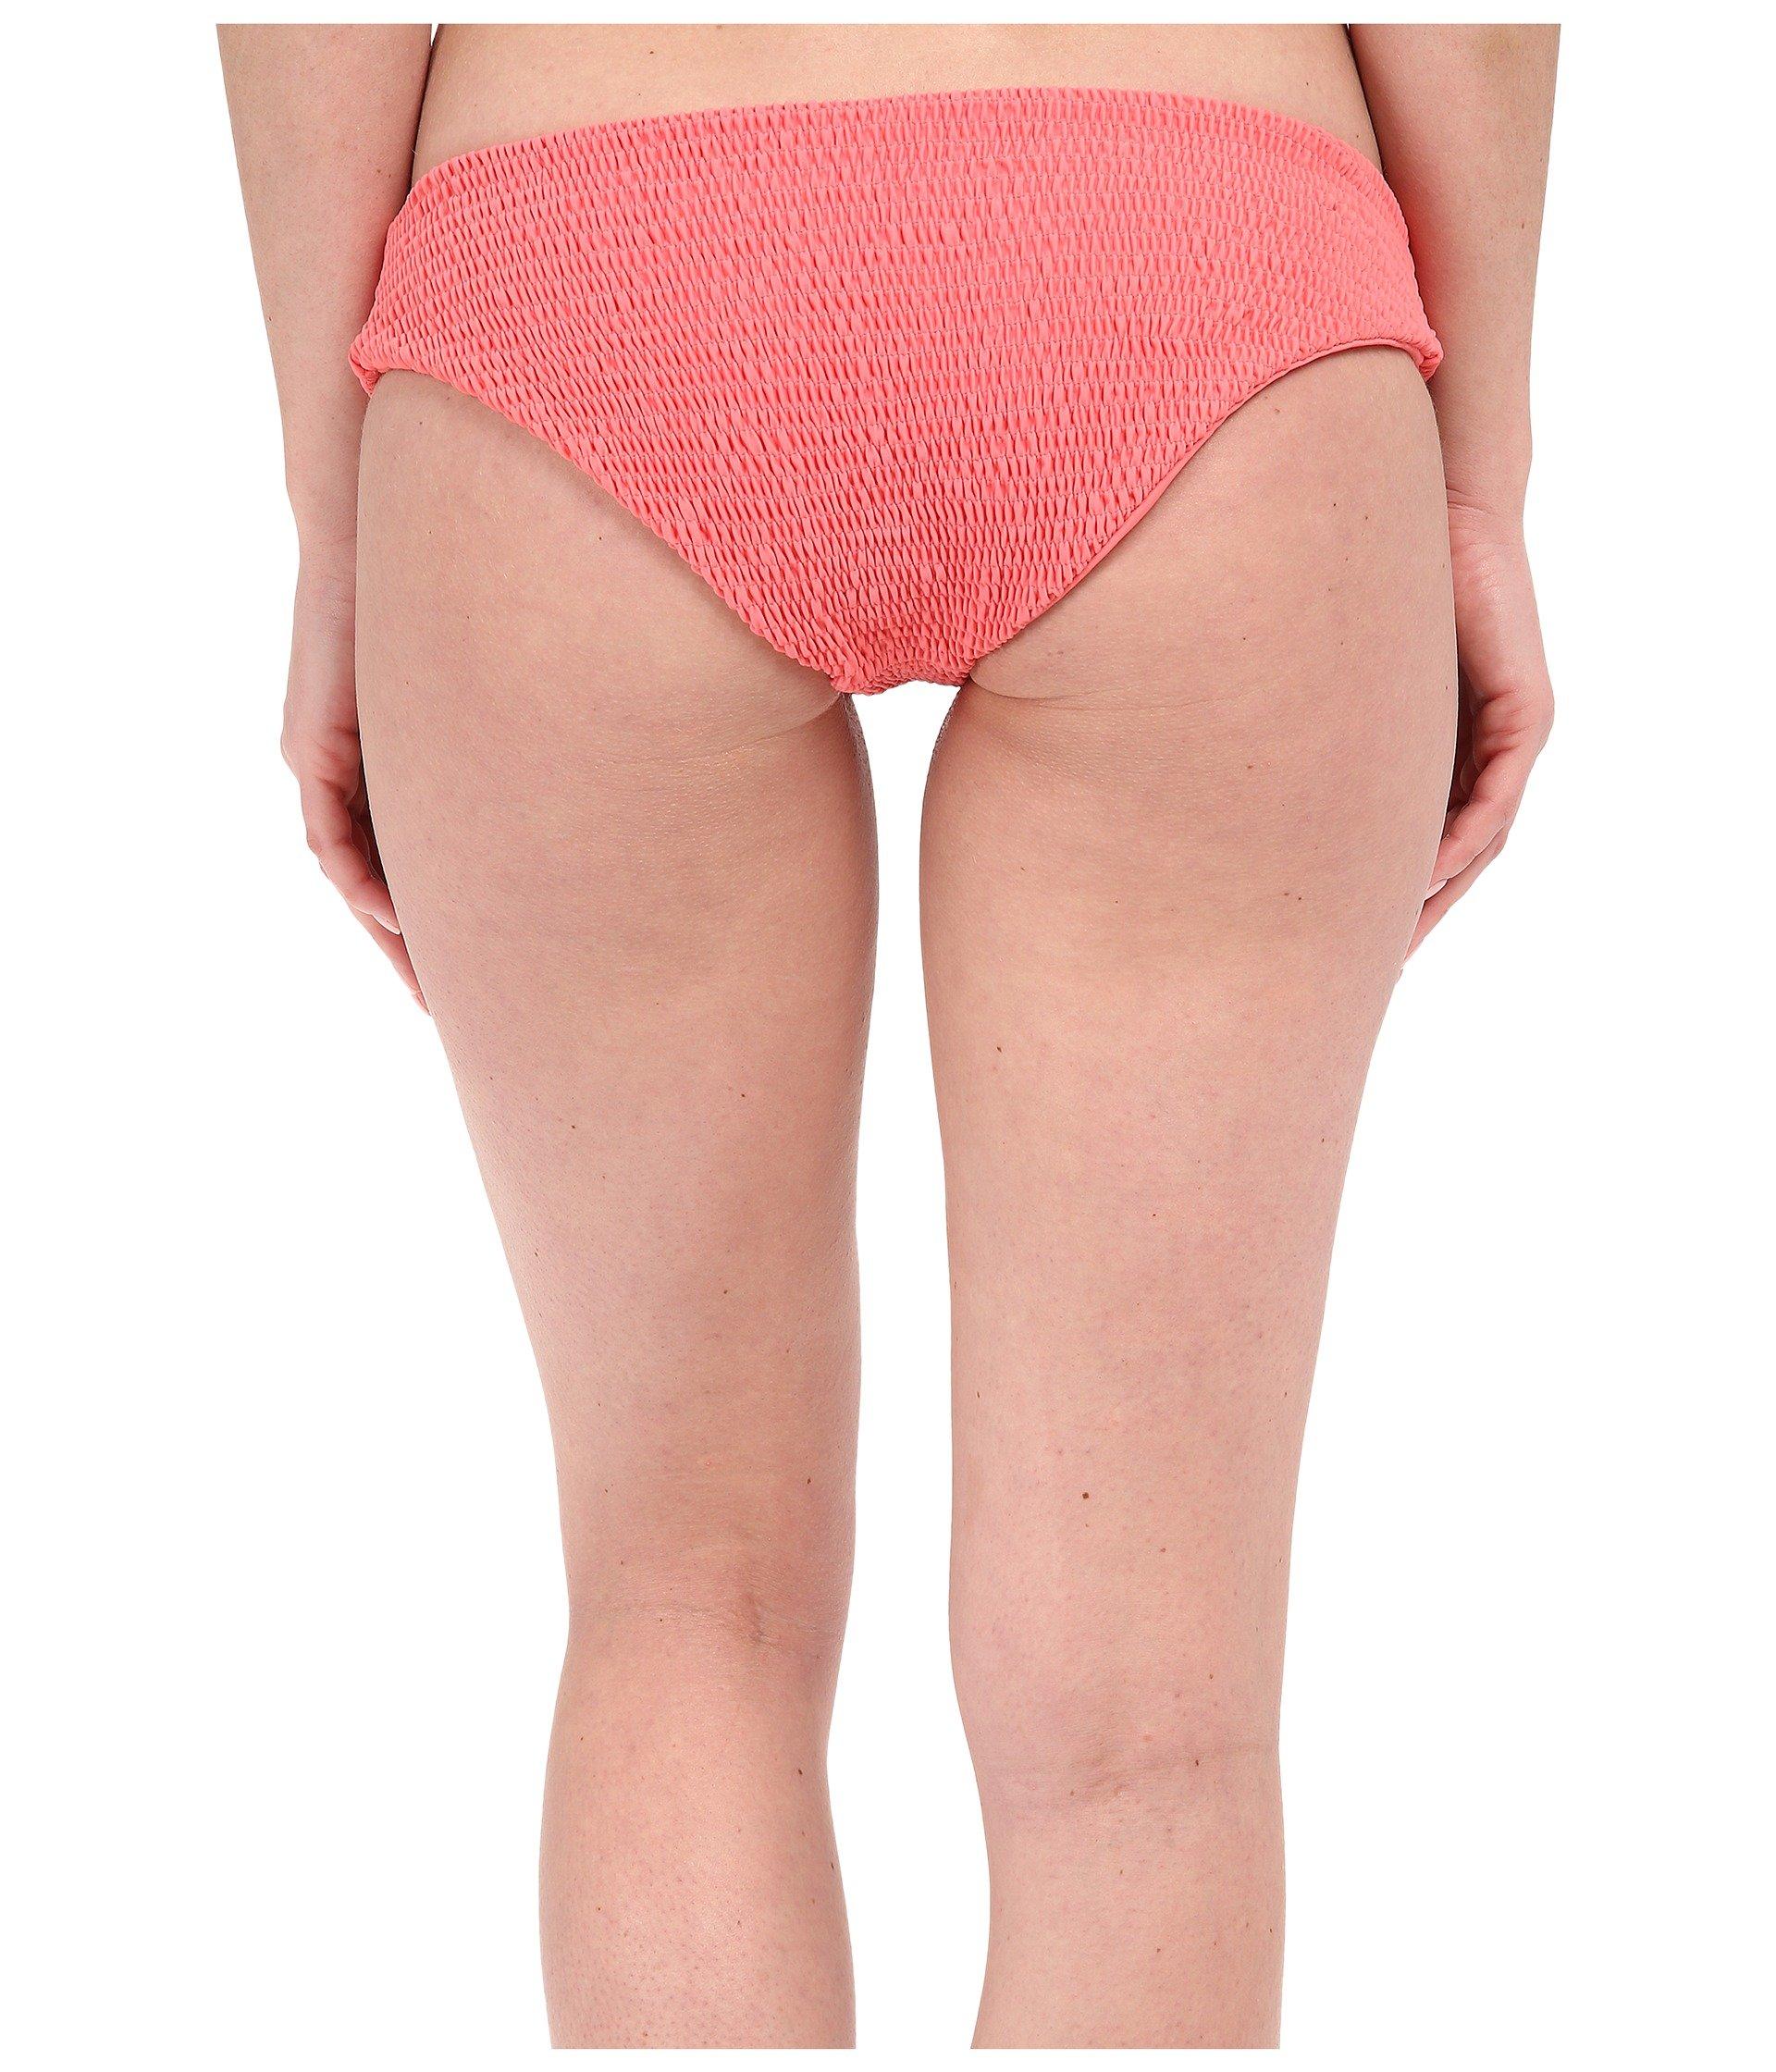 Tori praver swimwear Oaxaca Bottom Full Coverage in Pink ...